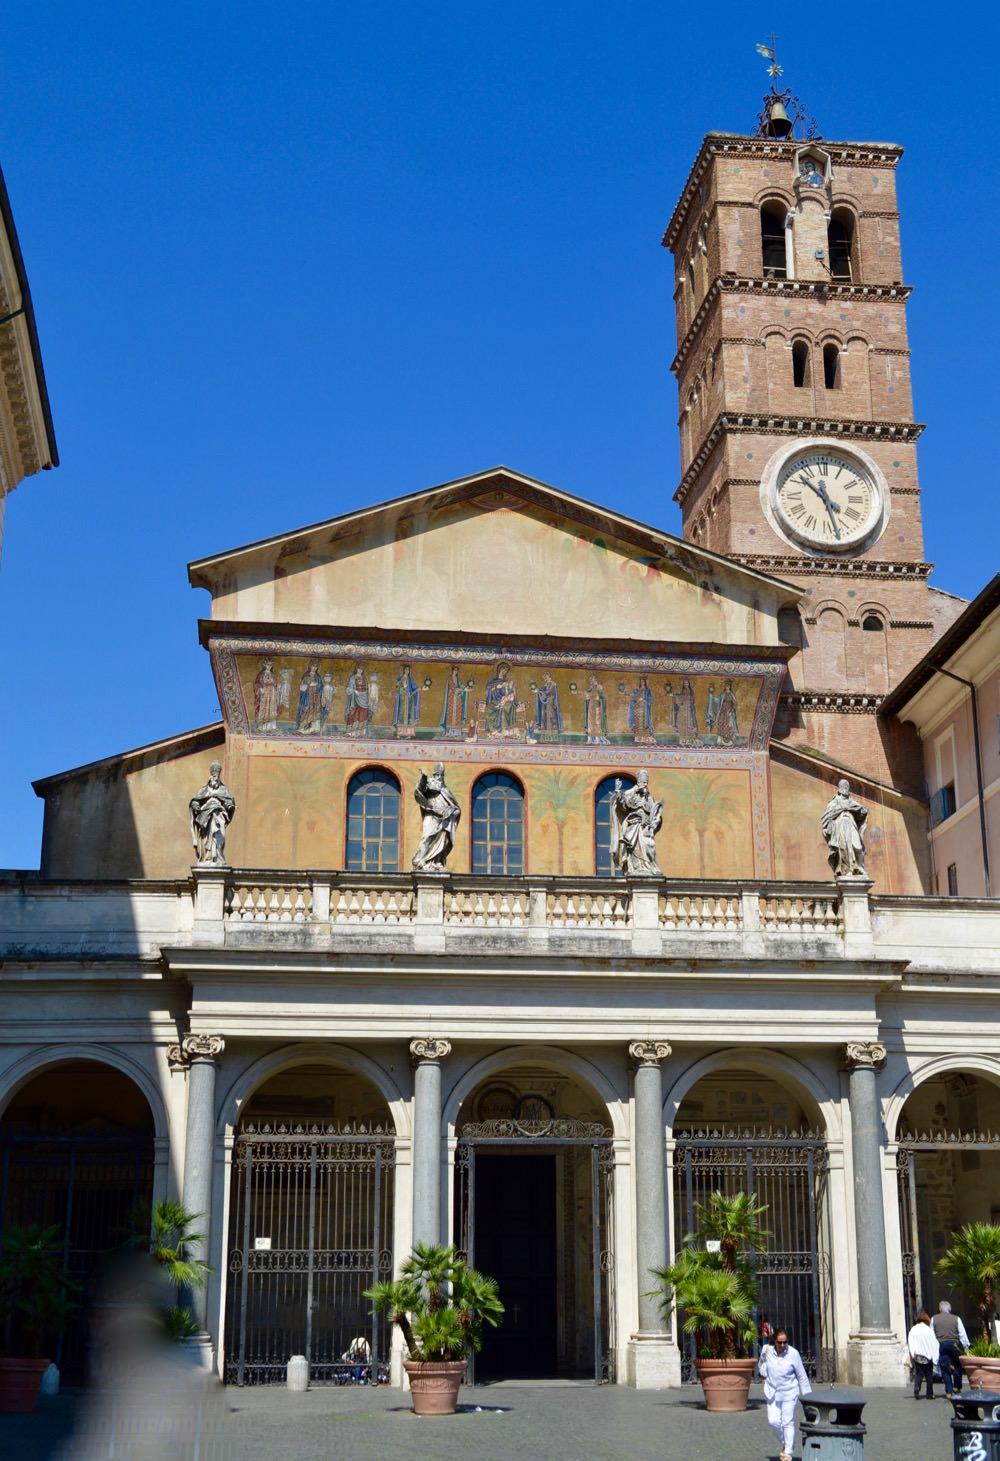 Biserica Santa Maria in Trastevere TOP oniective